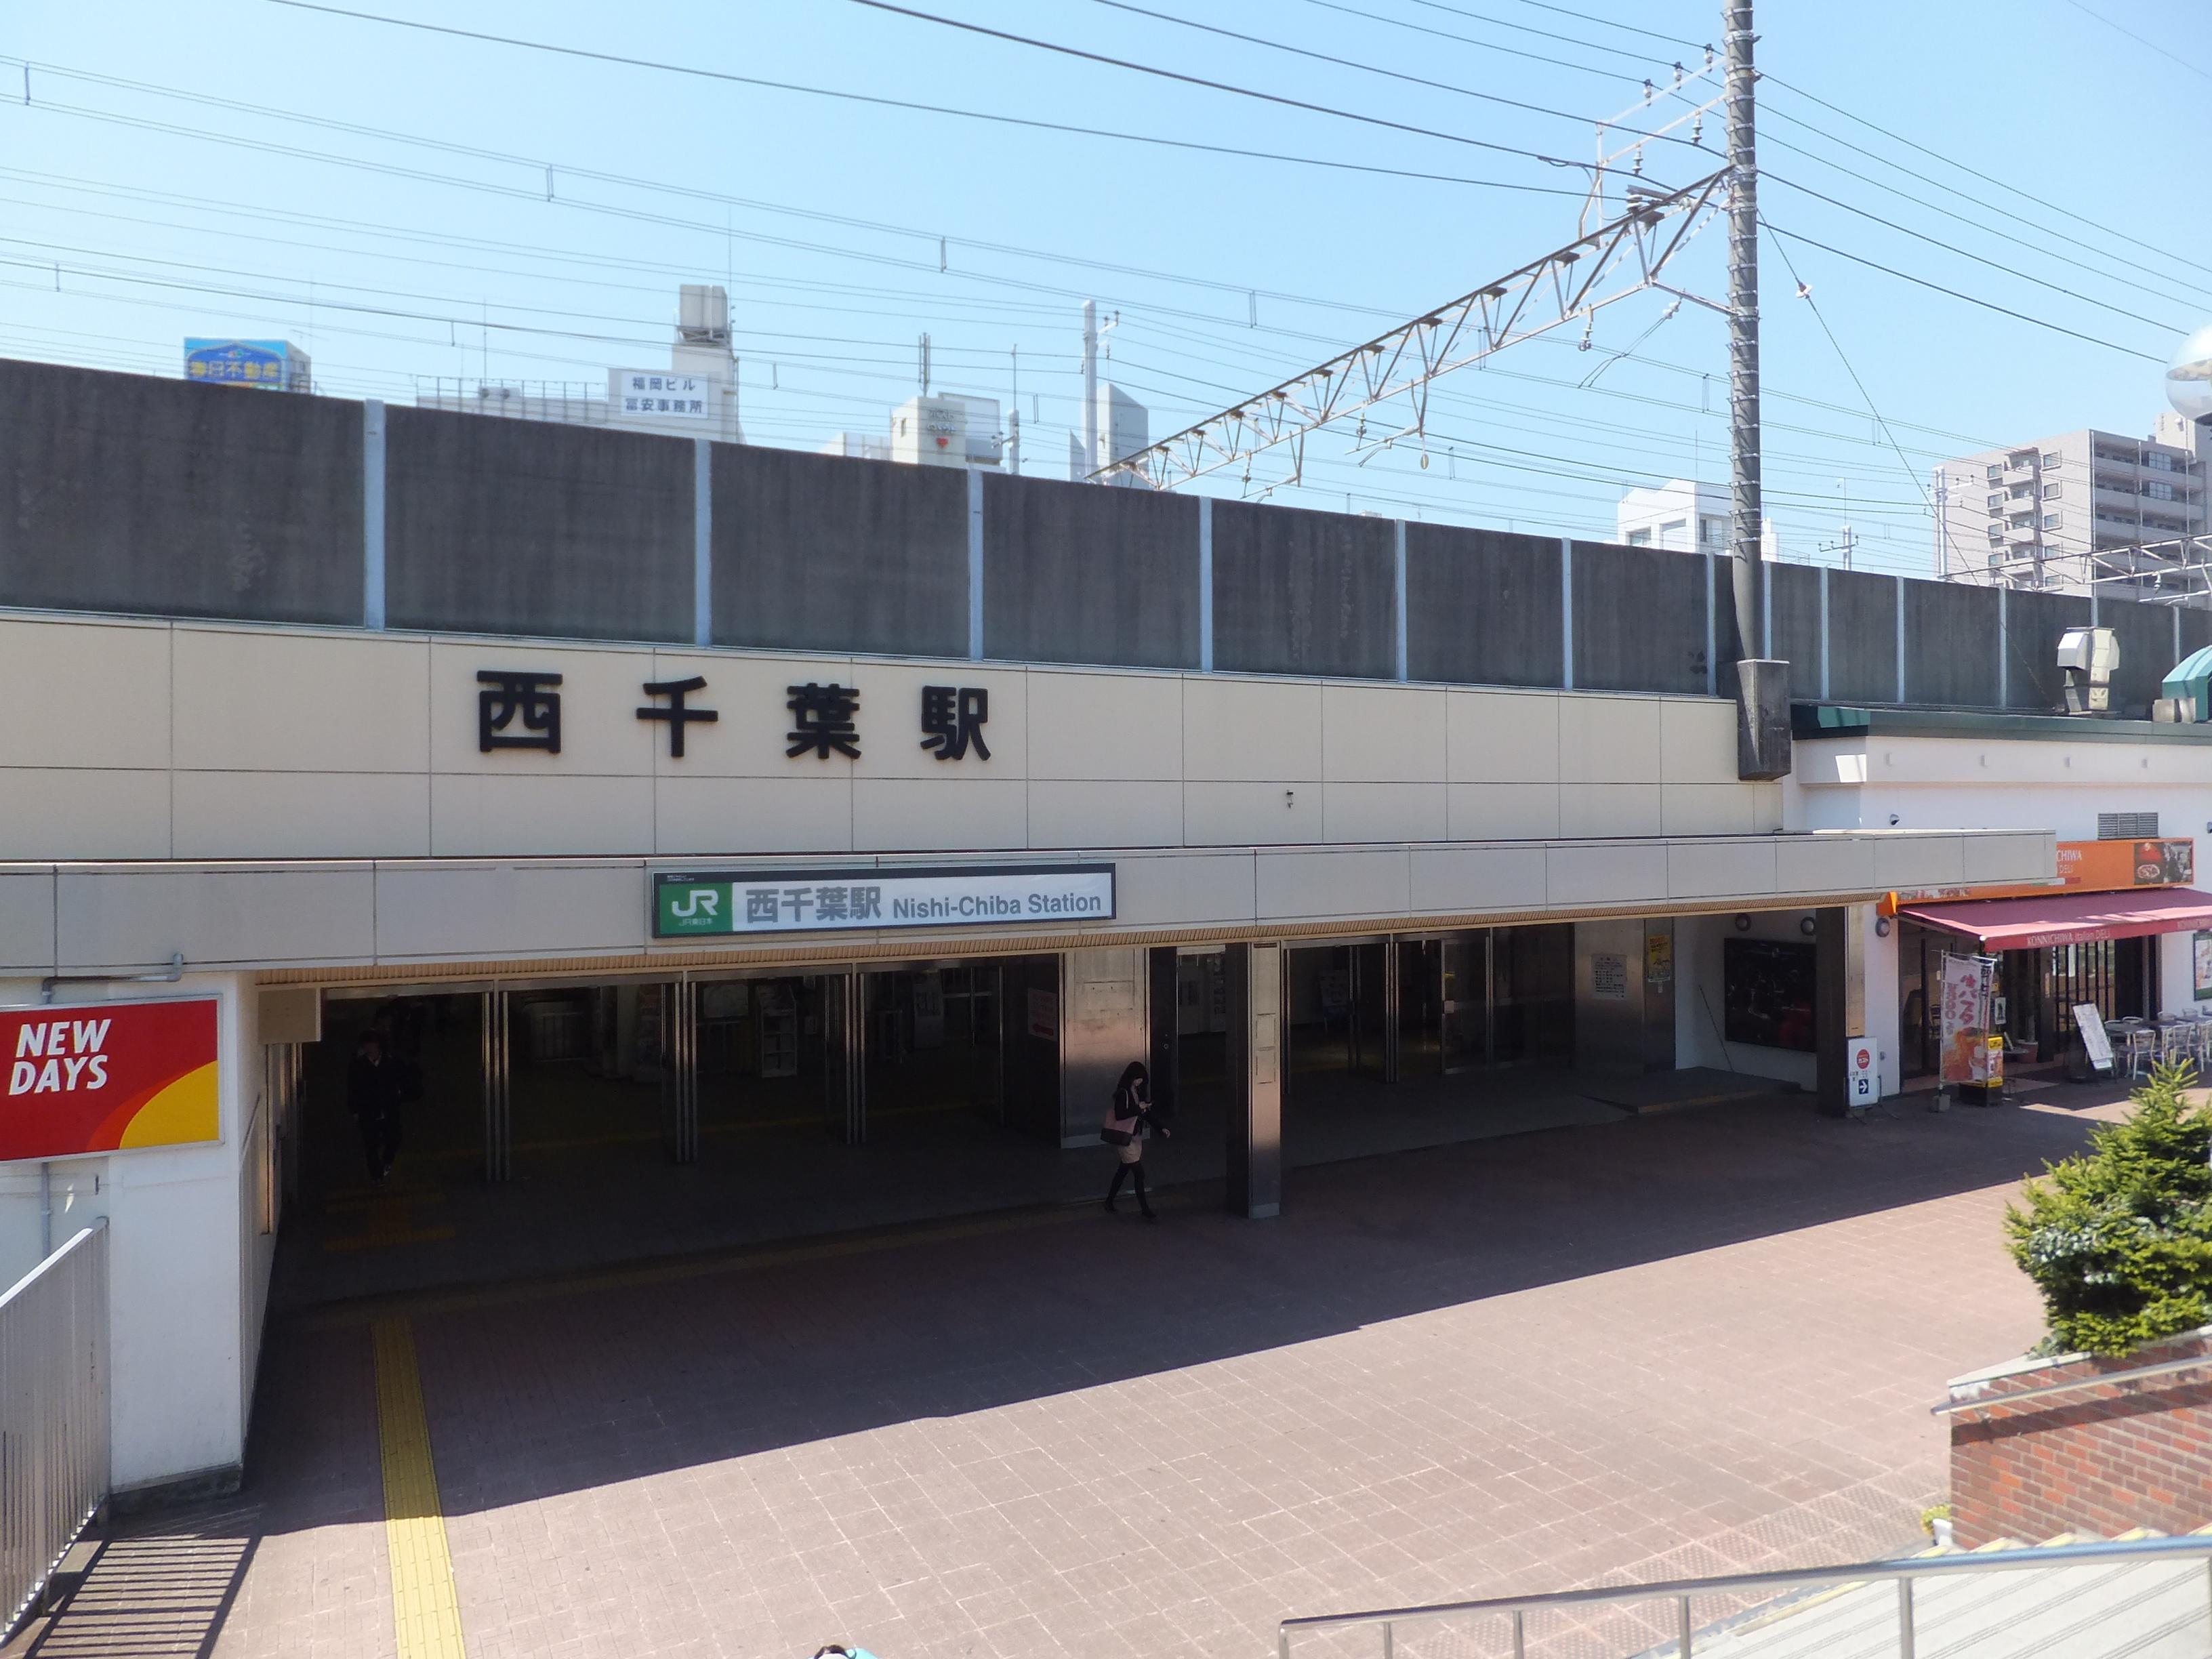 https://upload.wikimedia.org/wikipedia/commons/6/61/JR_Nishichiba_sta_009.jpg